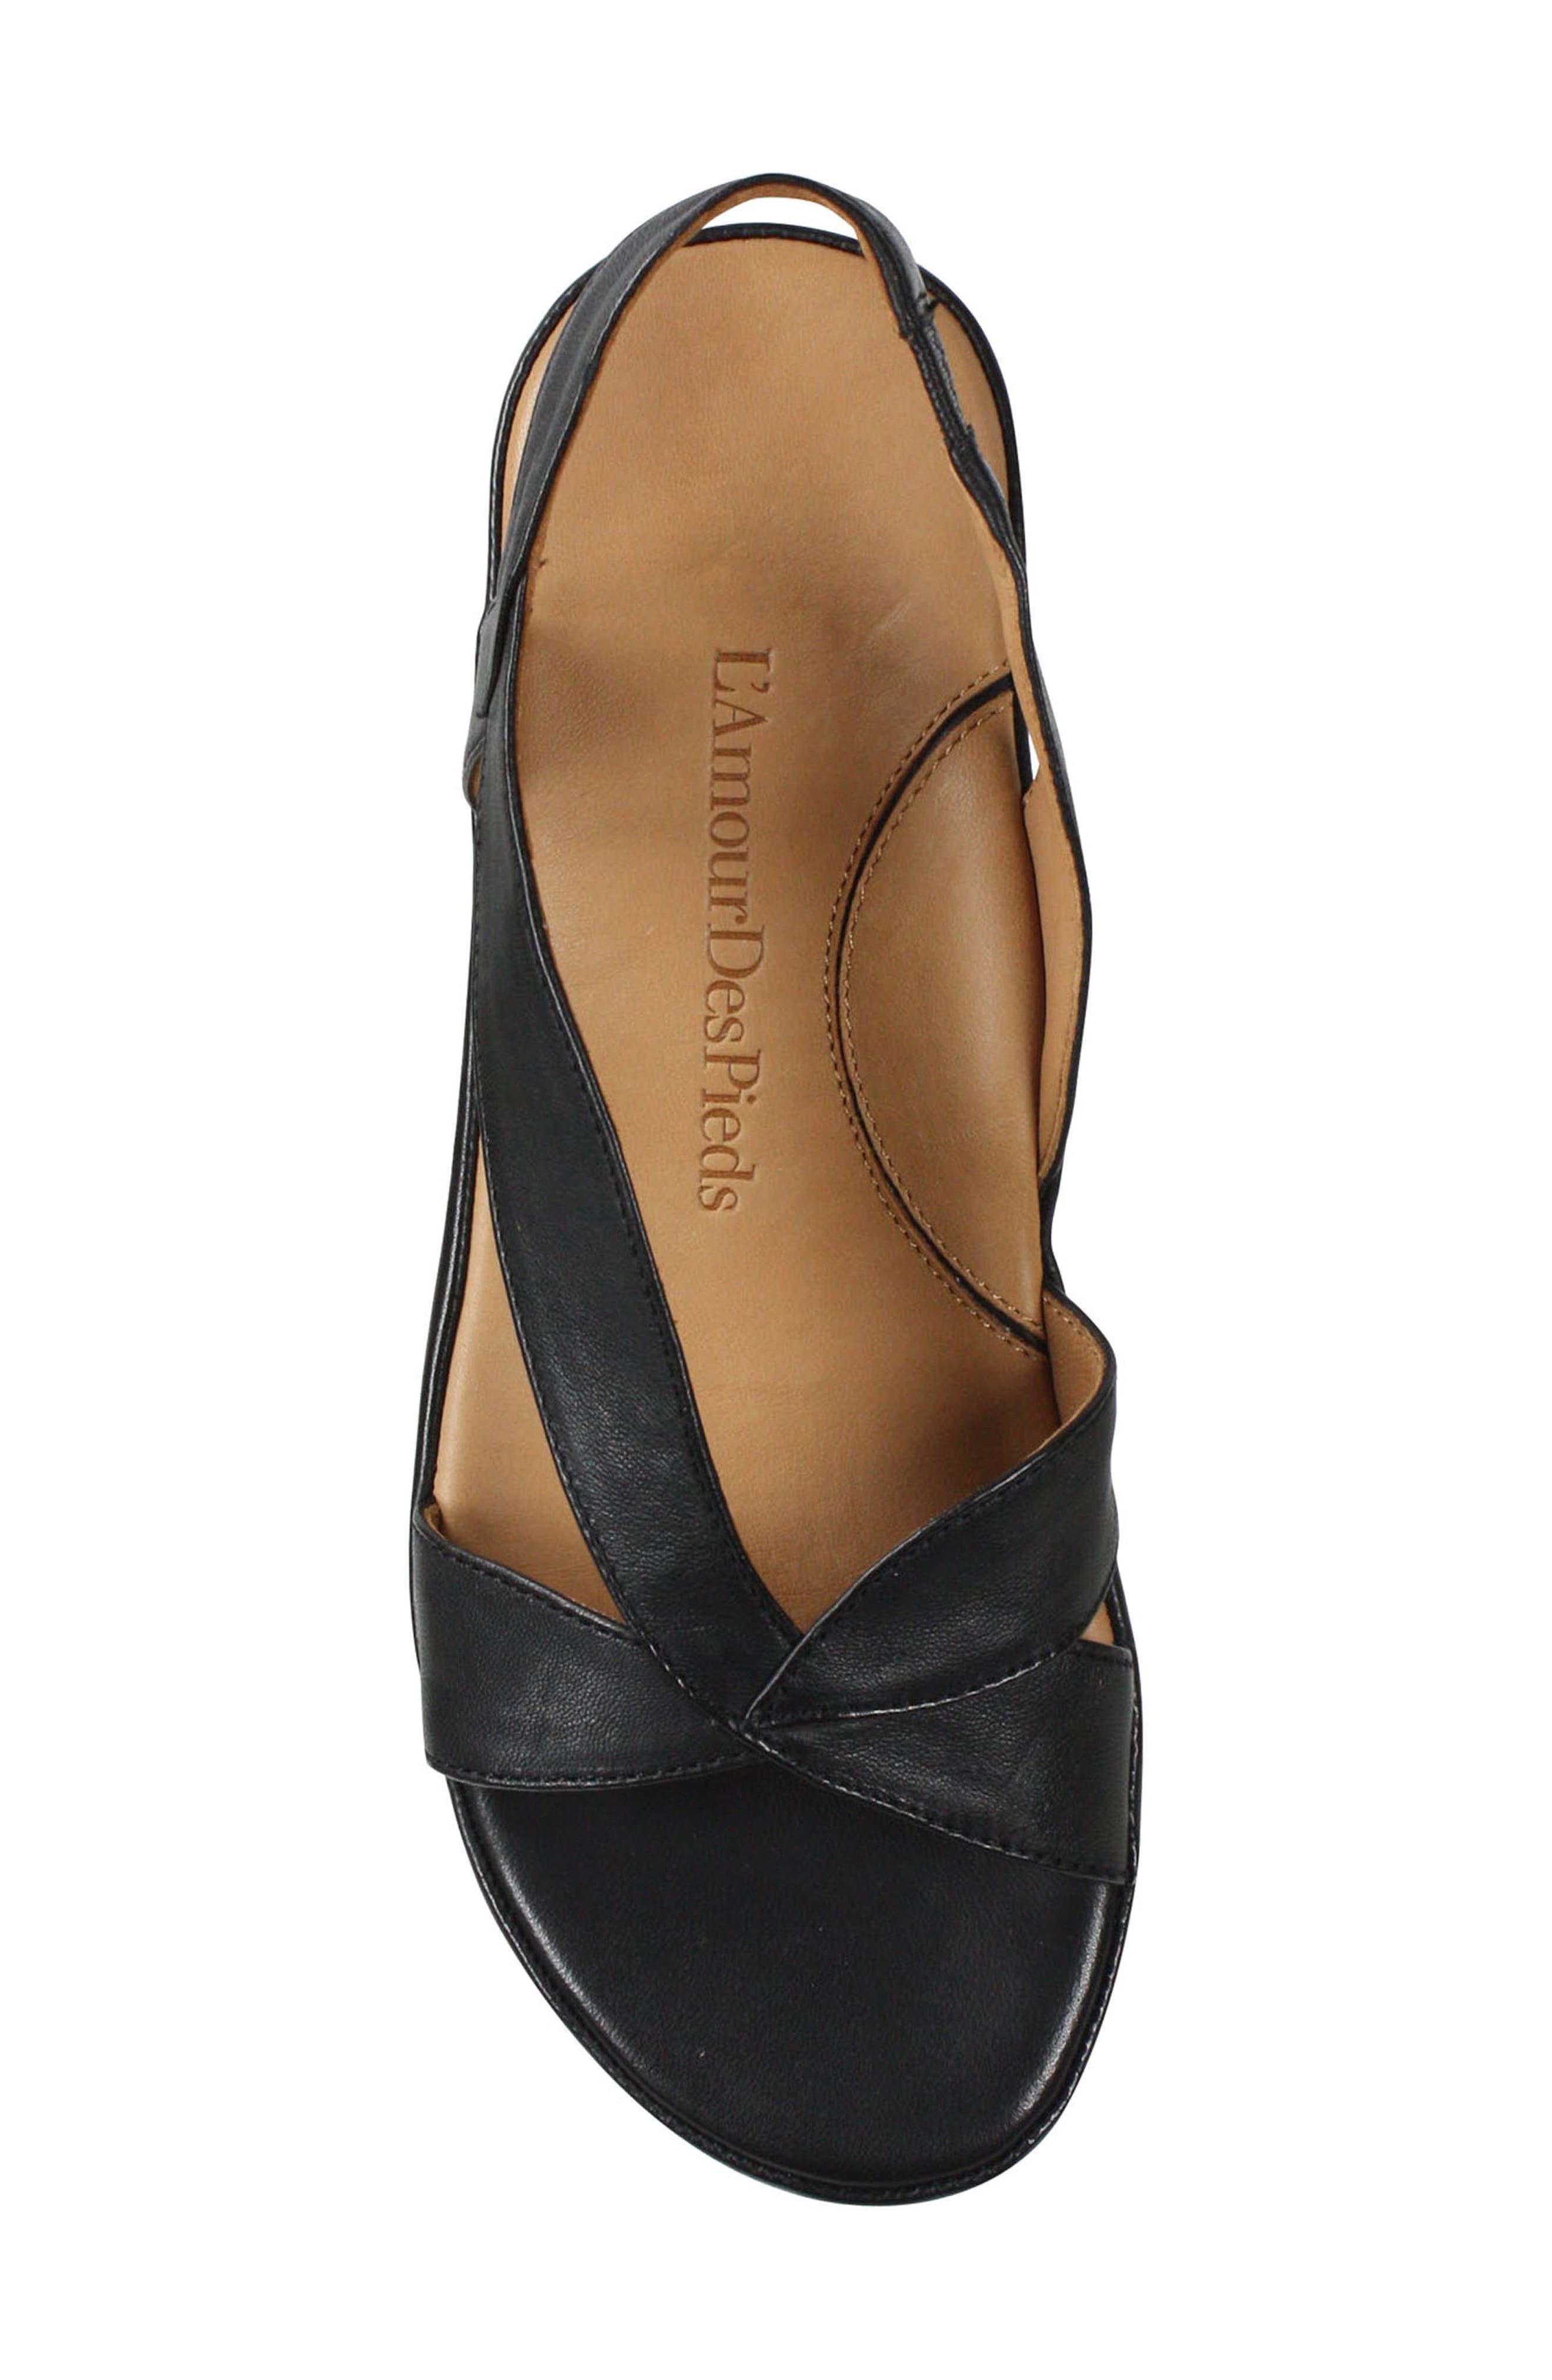 L'AMOUR DES PIEDS, Crotono Sandal, Alternate thumbnail 5, color, BLACK NAPPA LEATHER